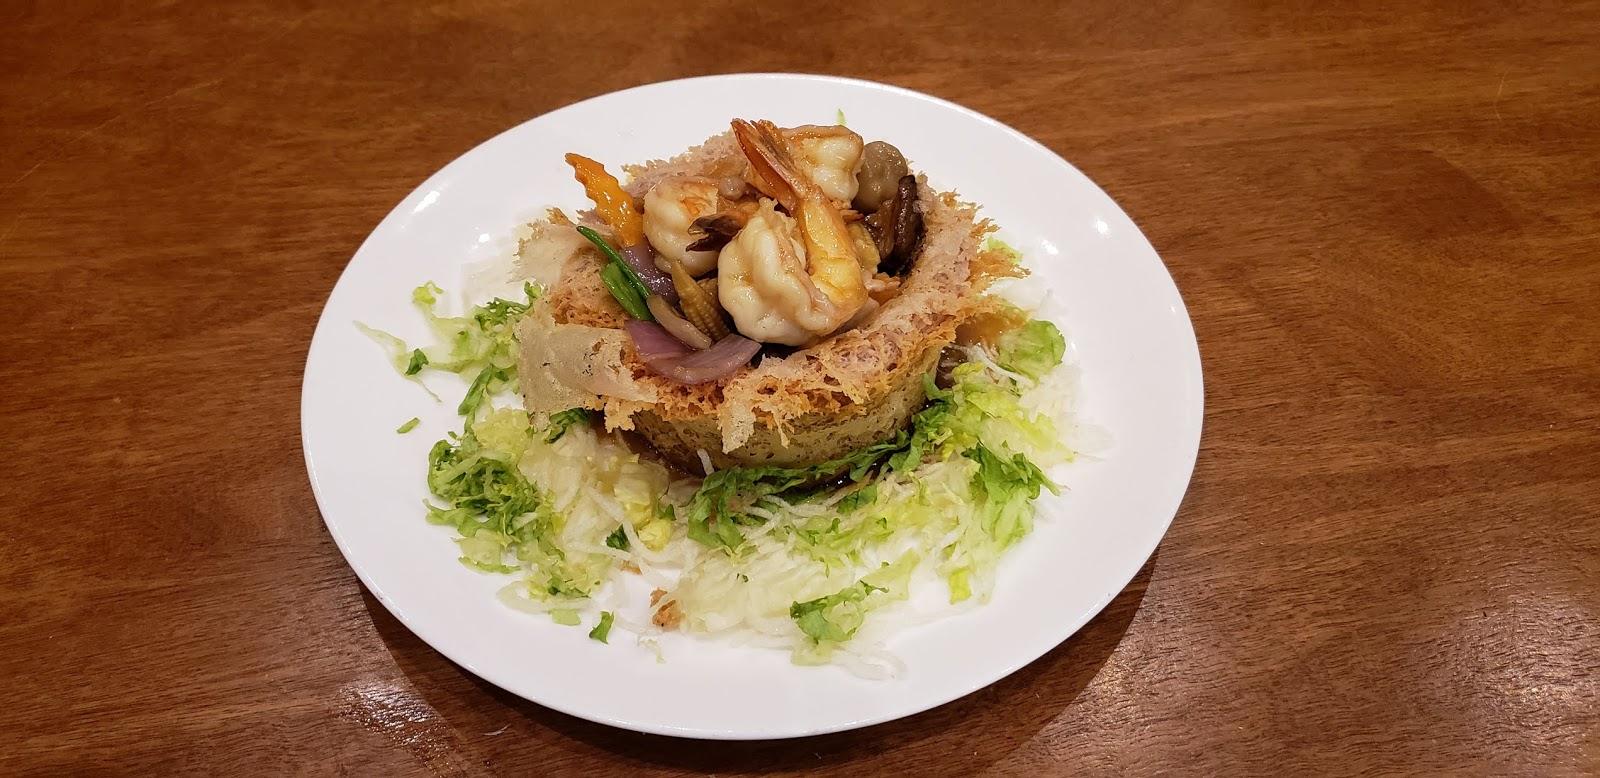 Chicken & Shrimp in Taro Nest